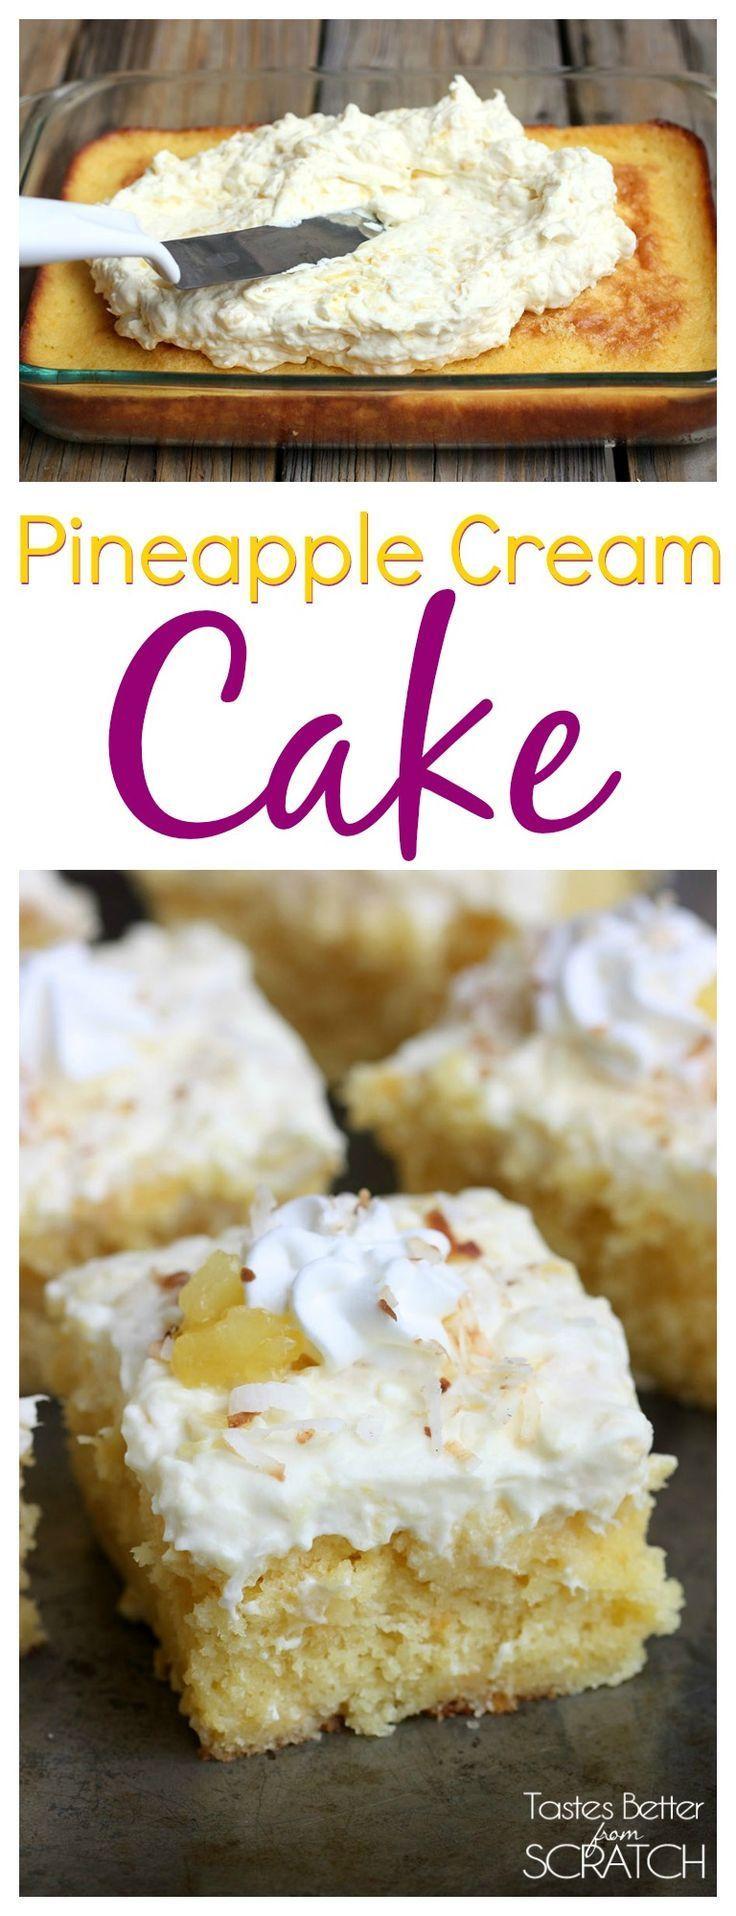 Pineapple Cream Cake is my favorite summer cake! Recipe from TastesBetterFromS...